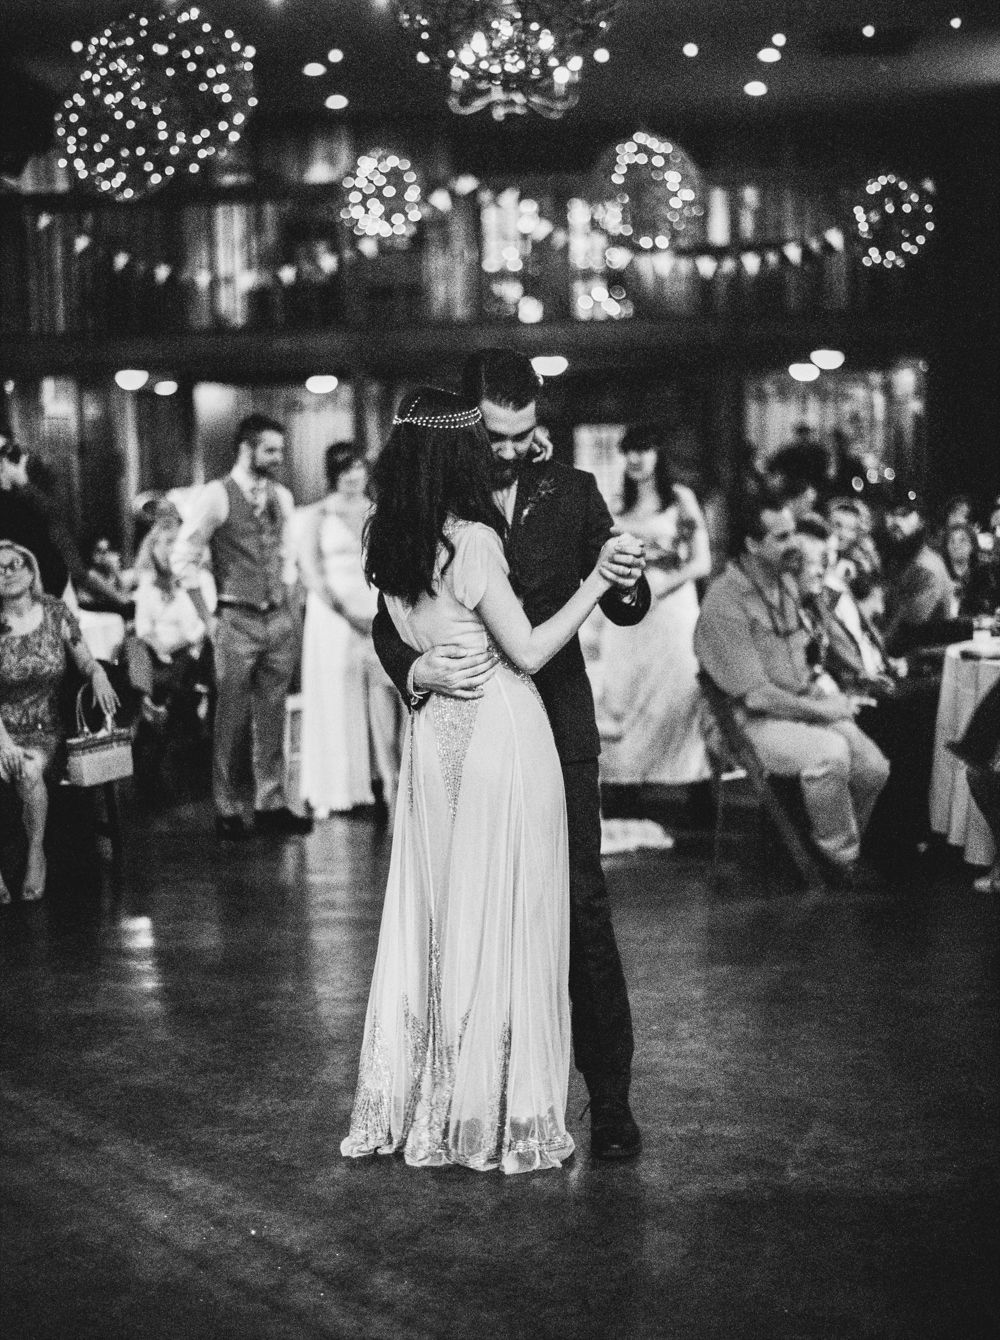 primer baile sea un éxito